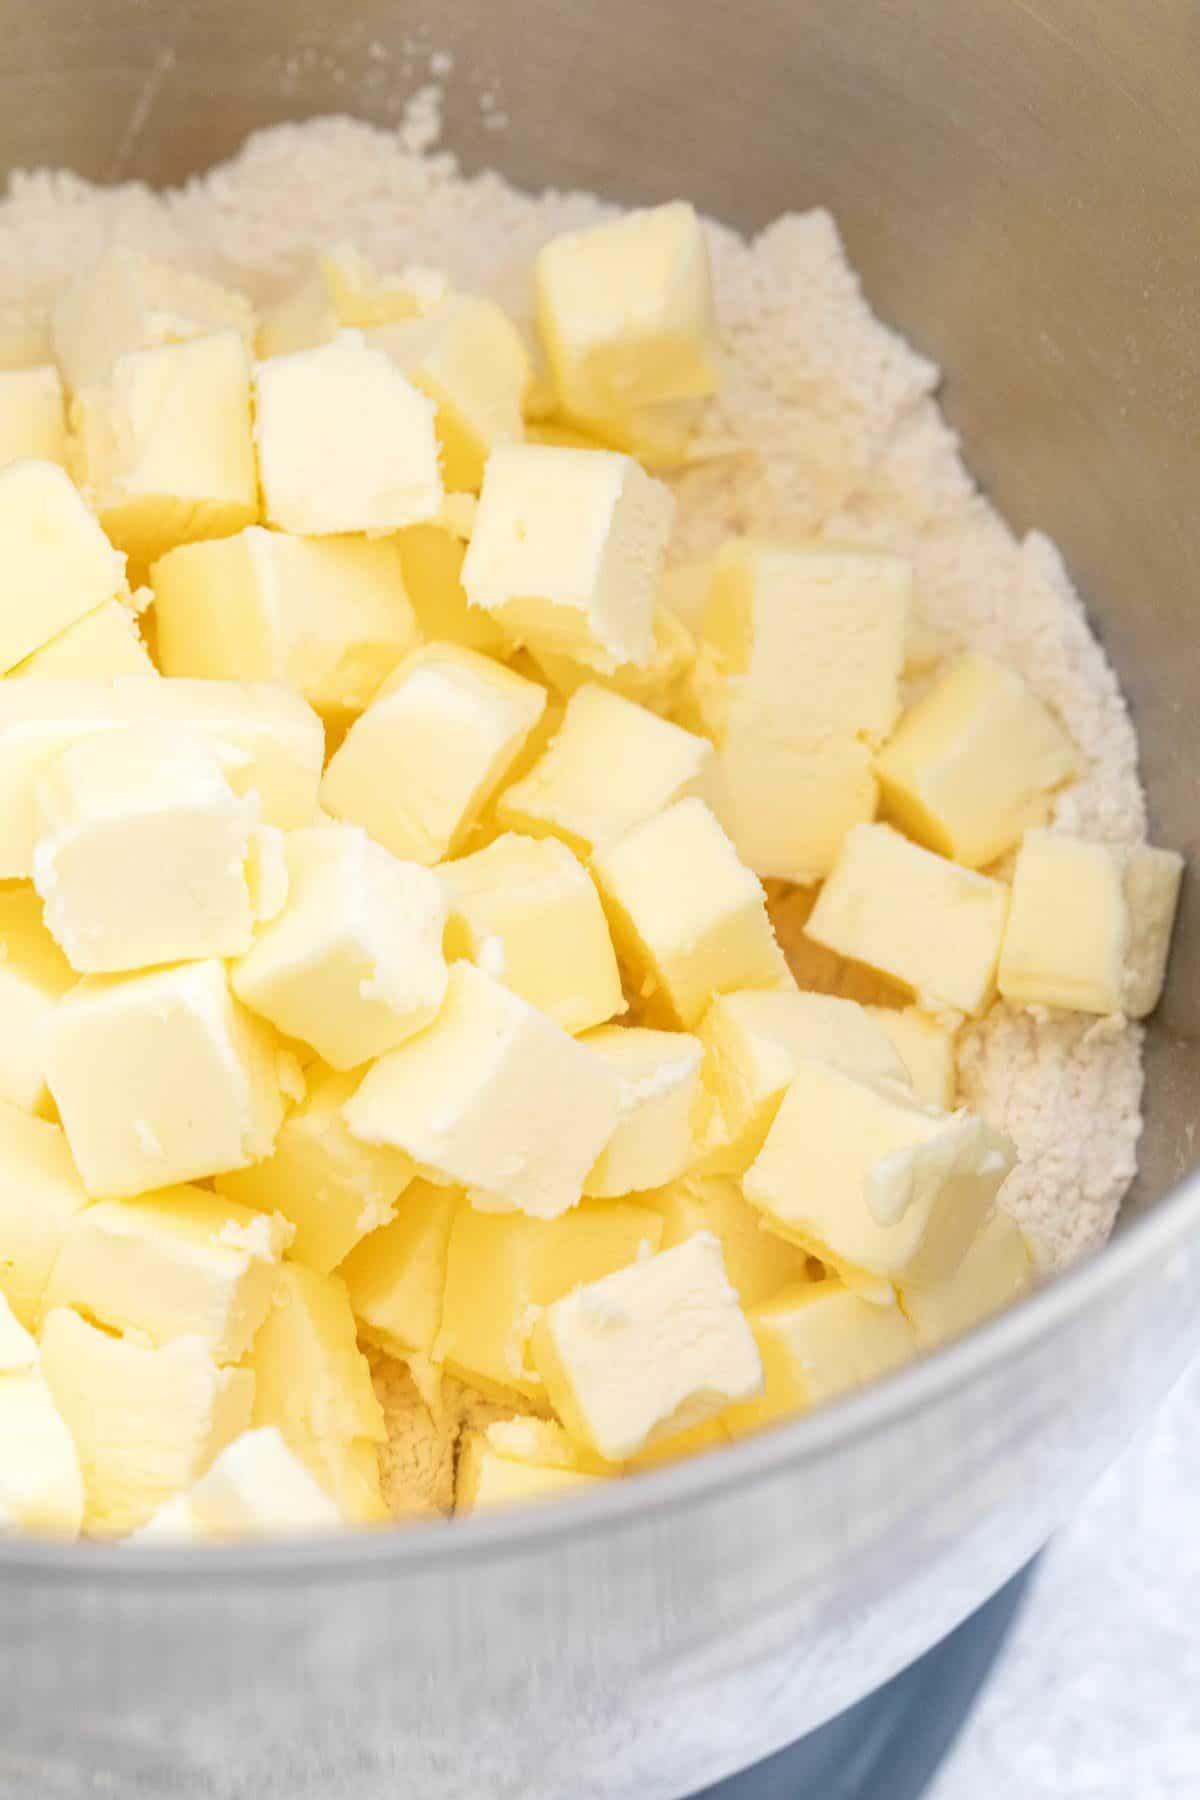 cubes of butter in a mixer